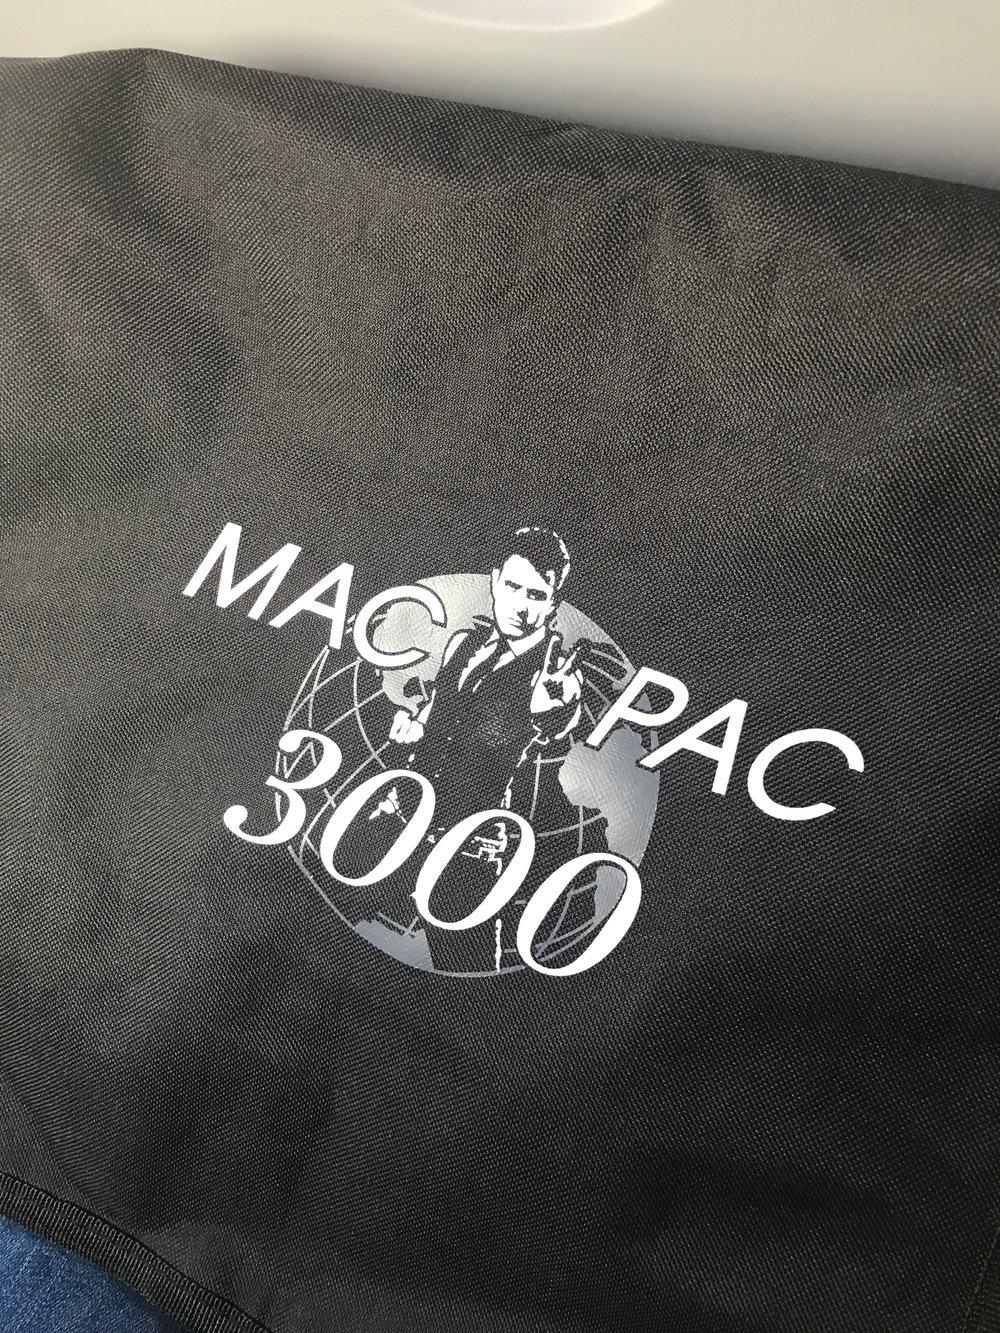 The MacPac 3000 had a great trip!